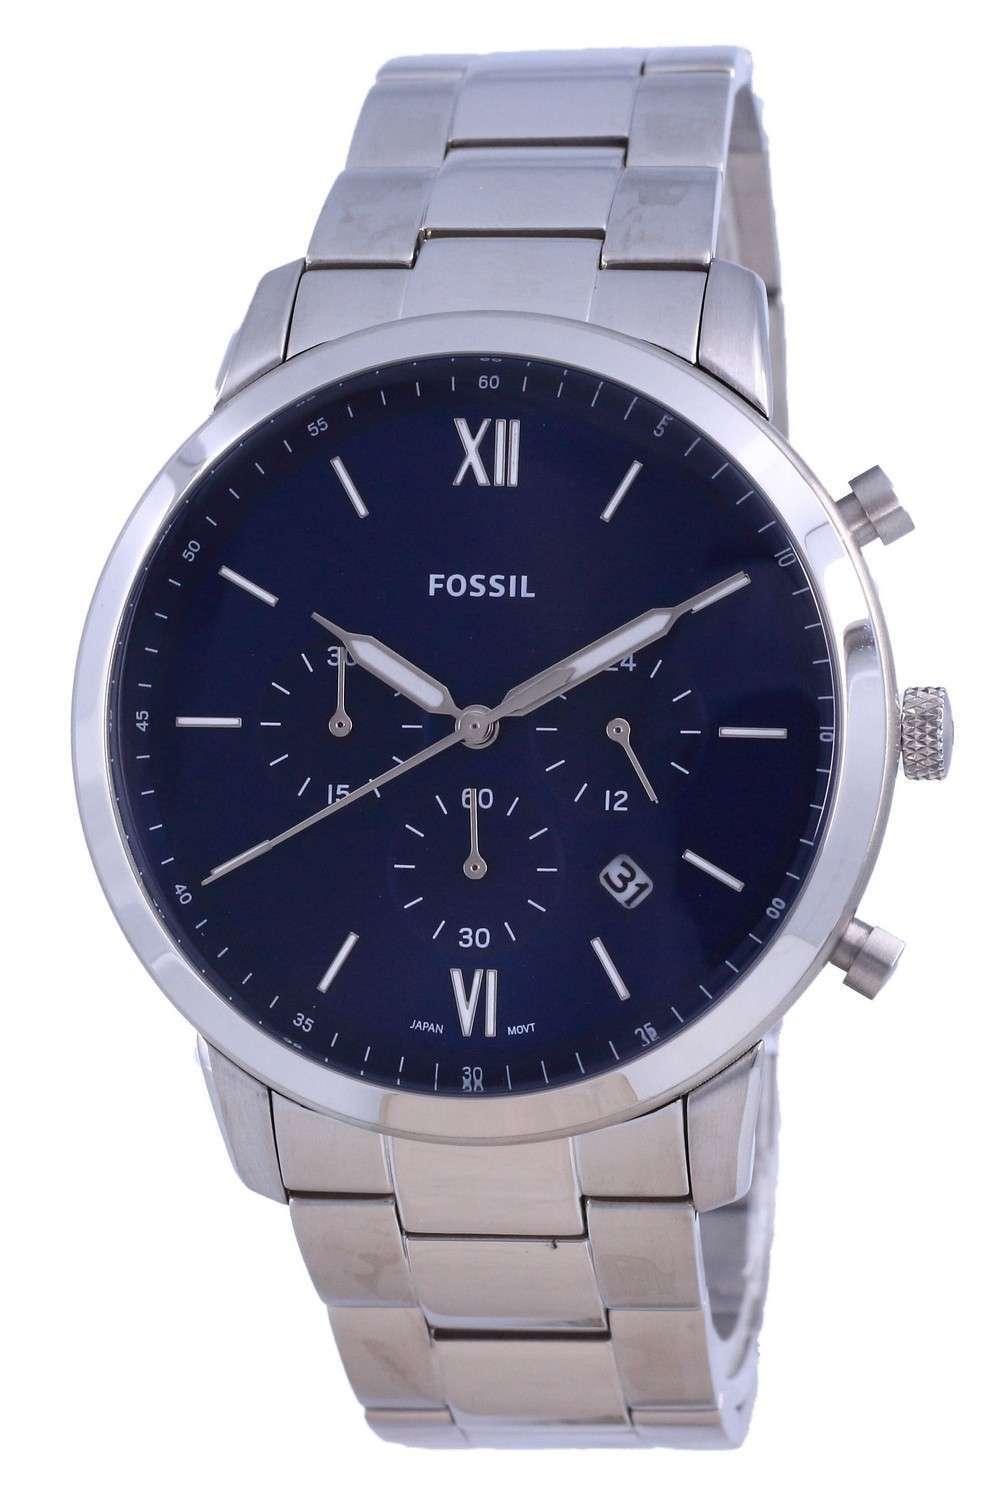 Fossil Neutra Reloj cronógrafo de acero inoxidable de cuarzo FS5792 para hombre